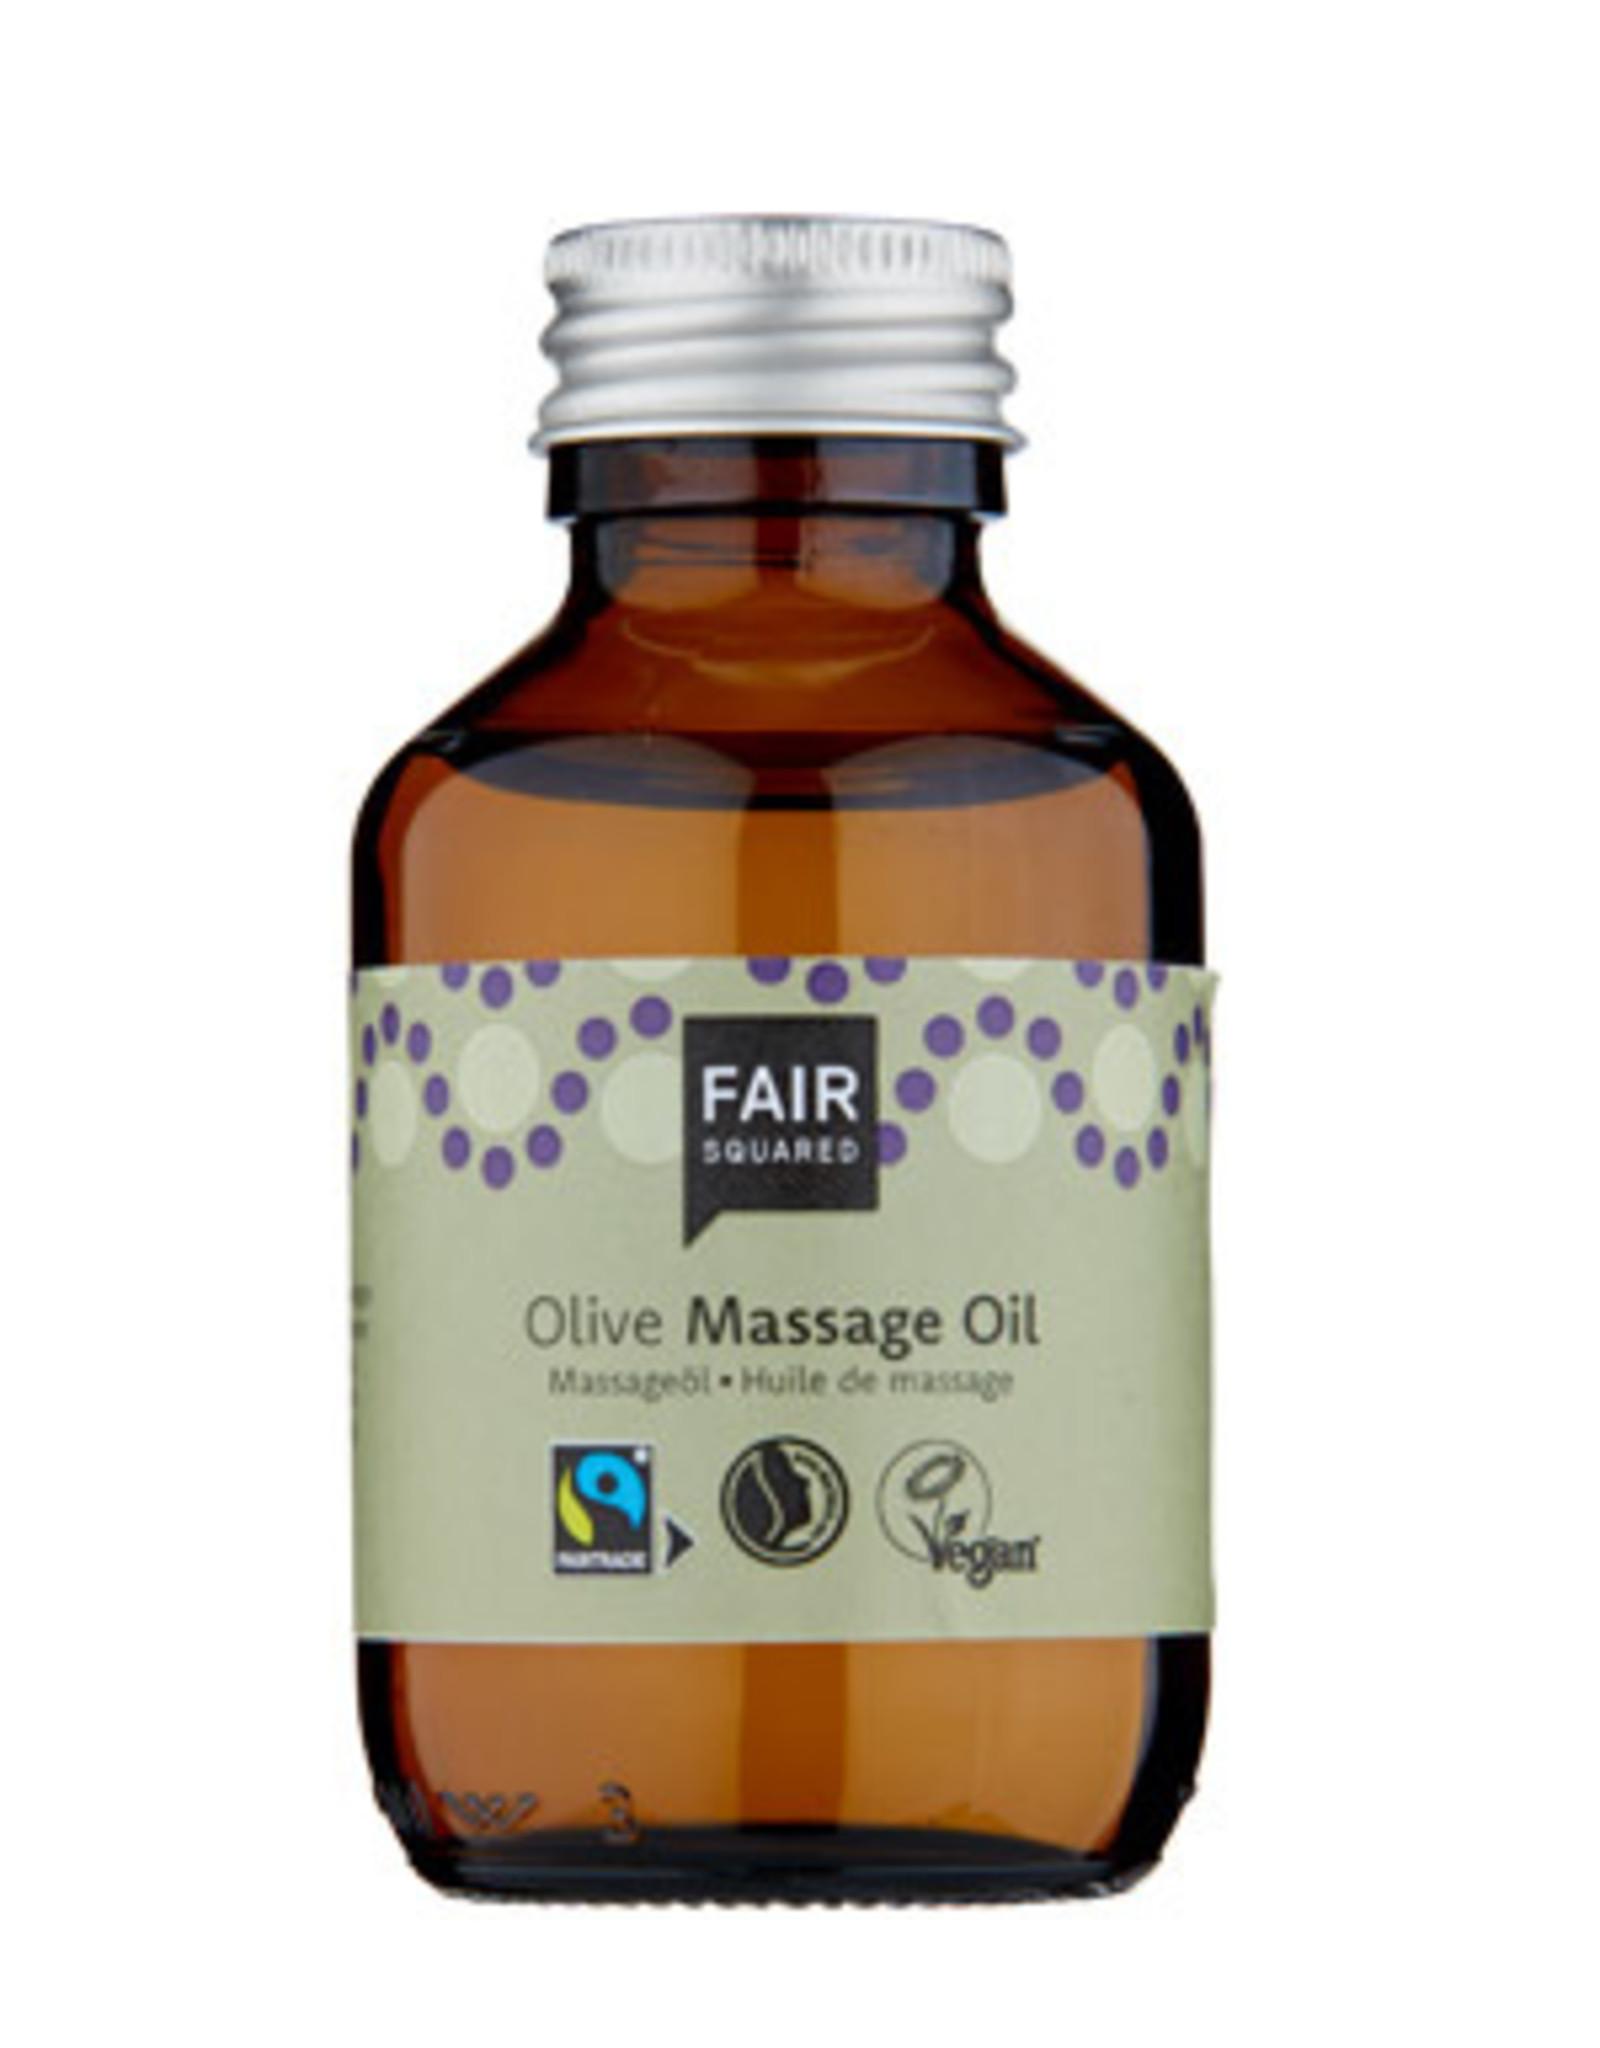 Fairsquared Massage Oil